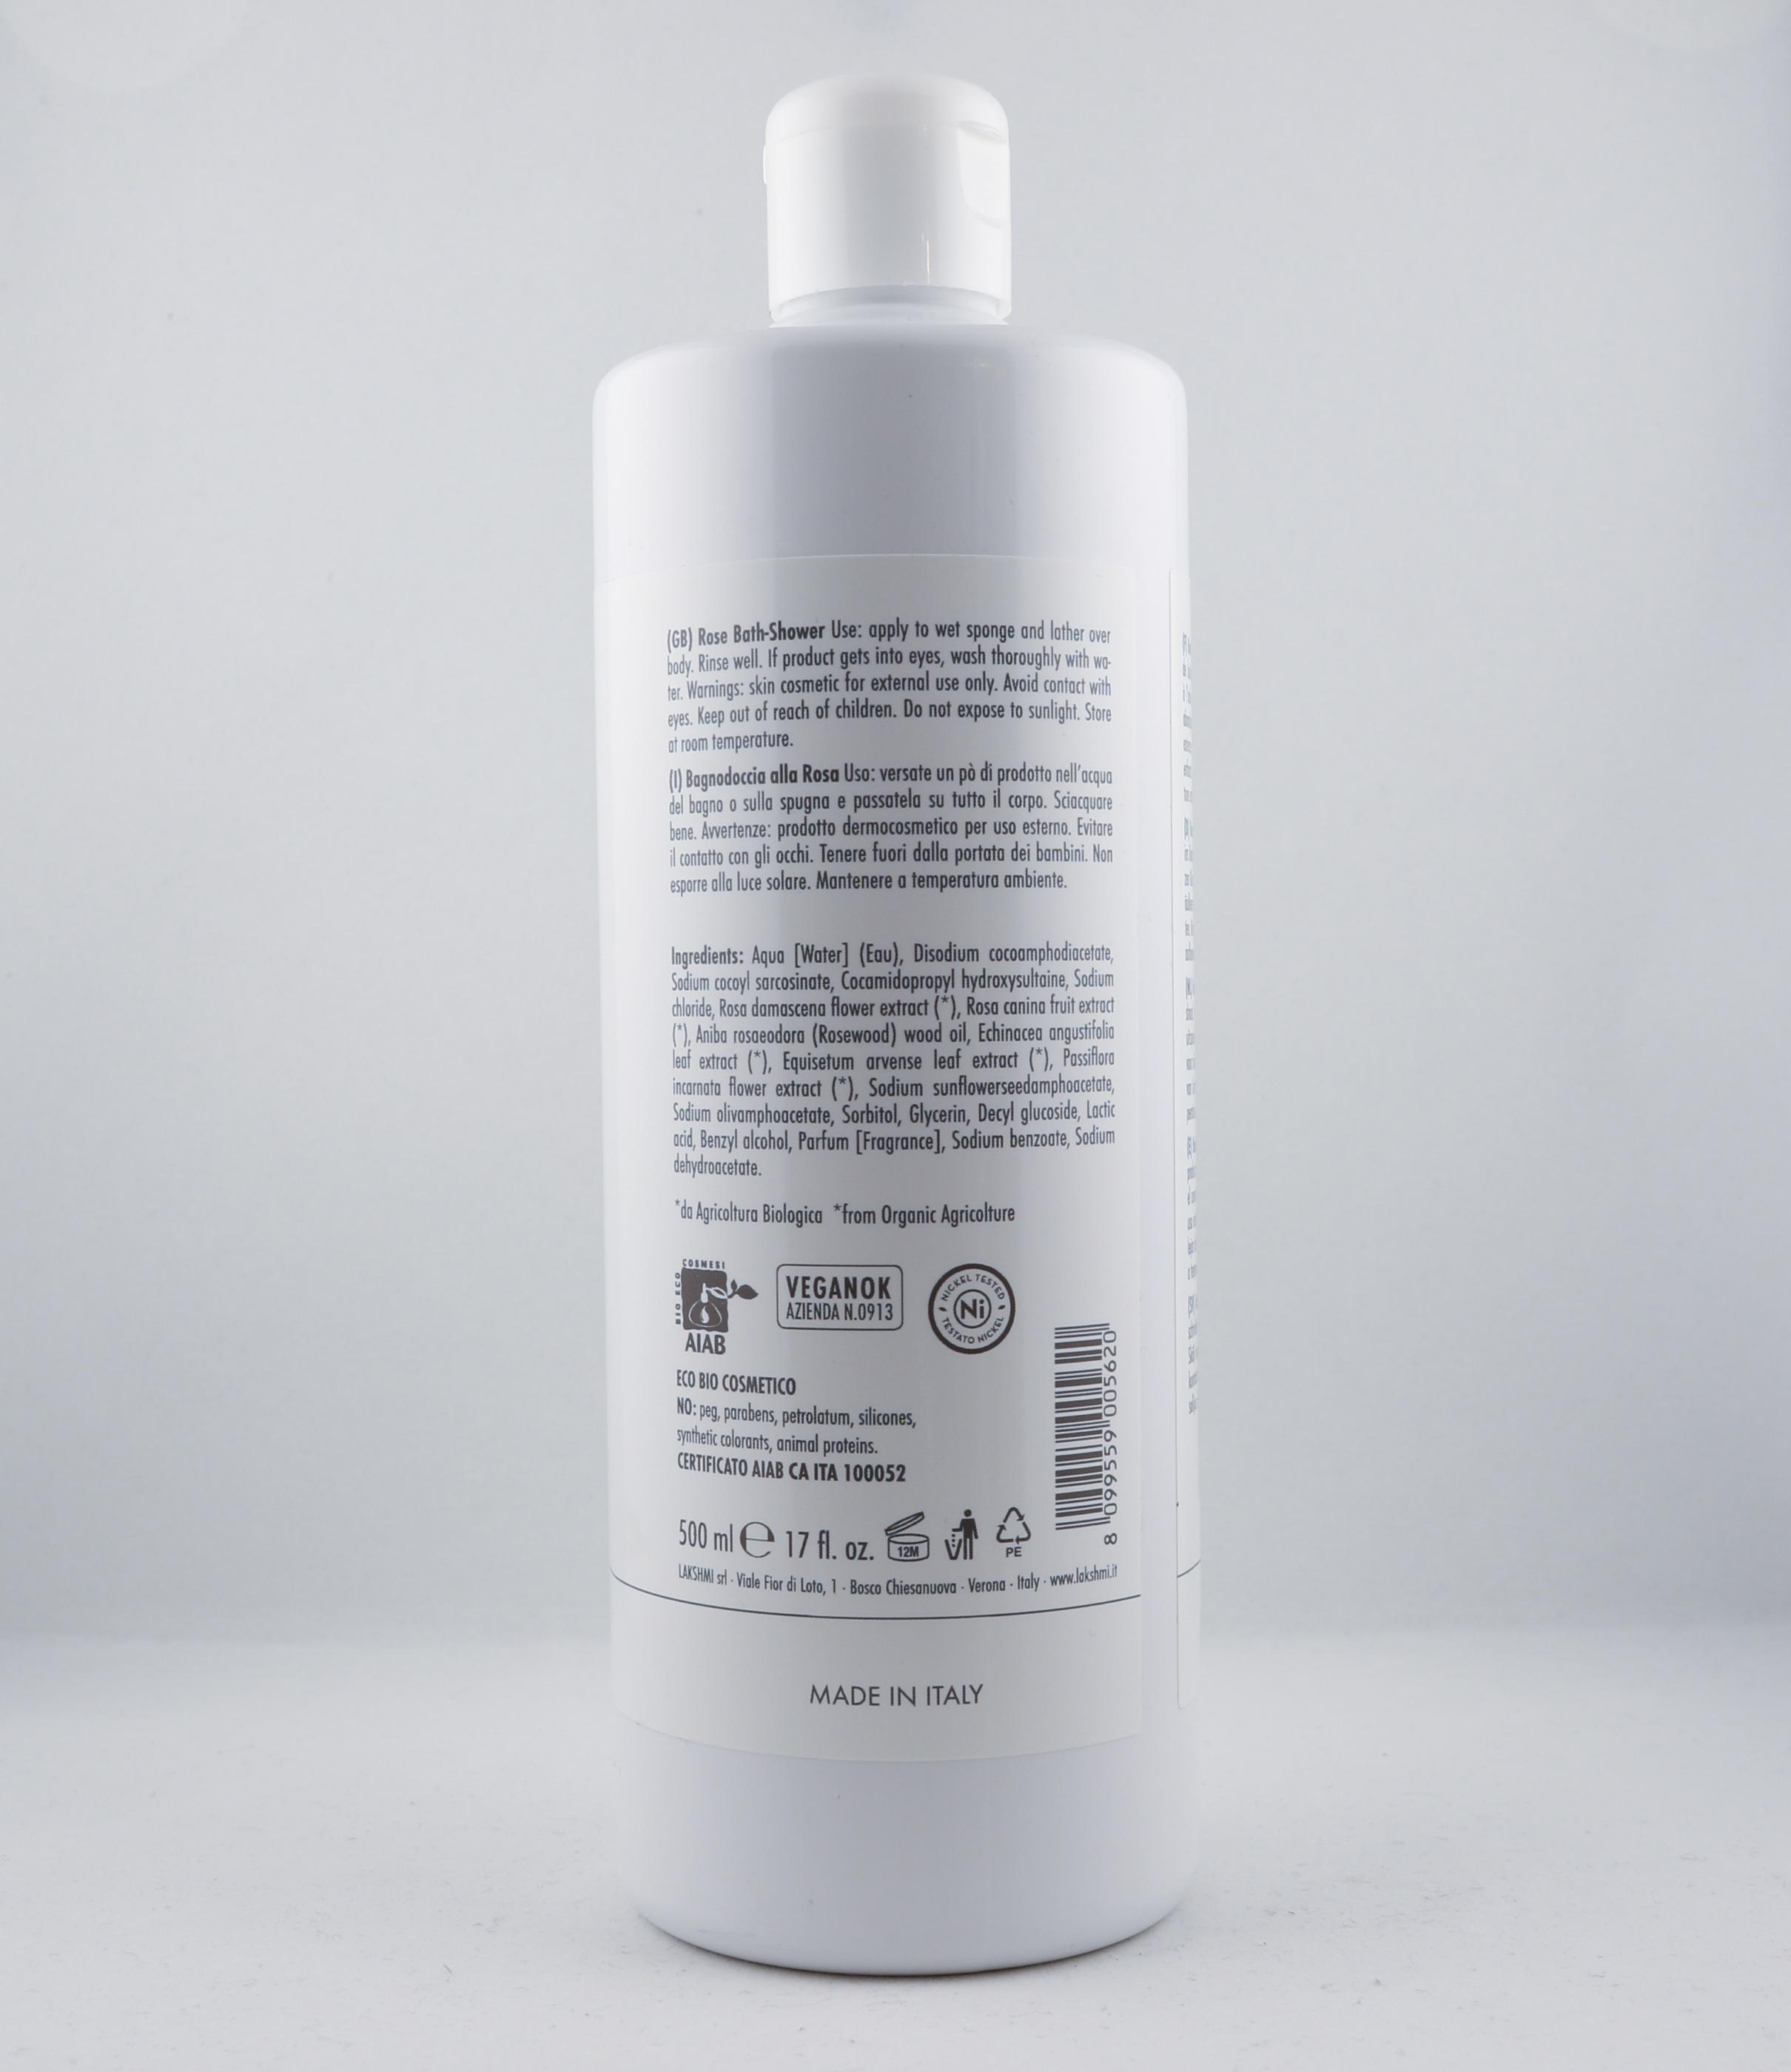 Pitta Rose Bath-shower wellness ayurveda halmstad sweden svensk hygien